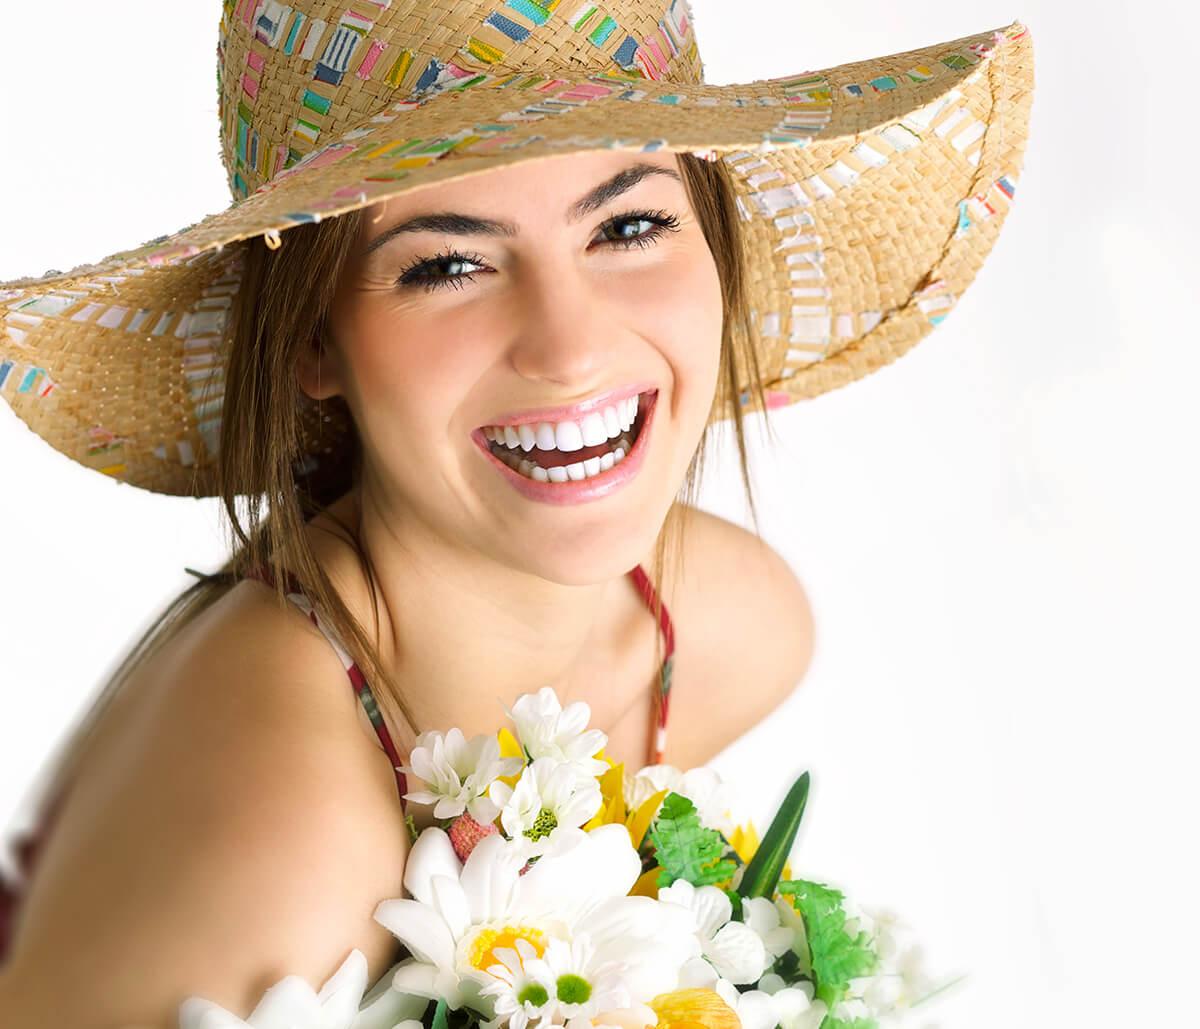 Snap-on Smile Procedure at Pines Dental Associates in Pembroke Pines Area